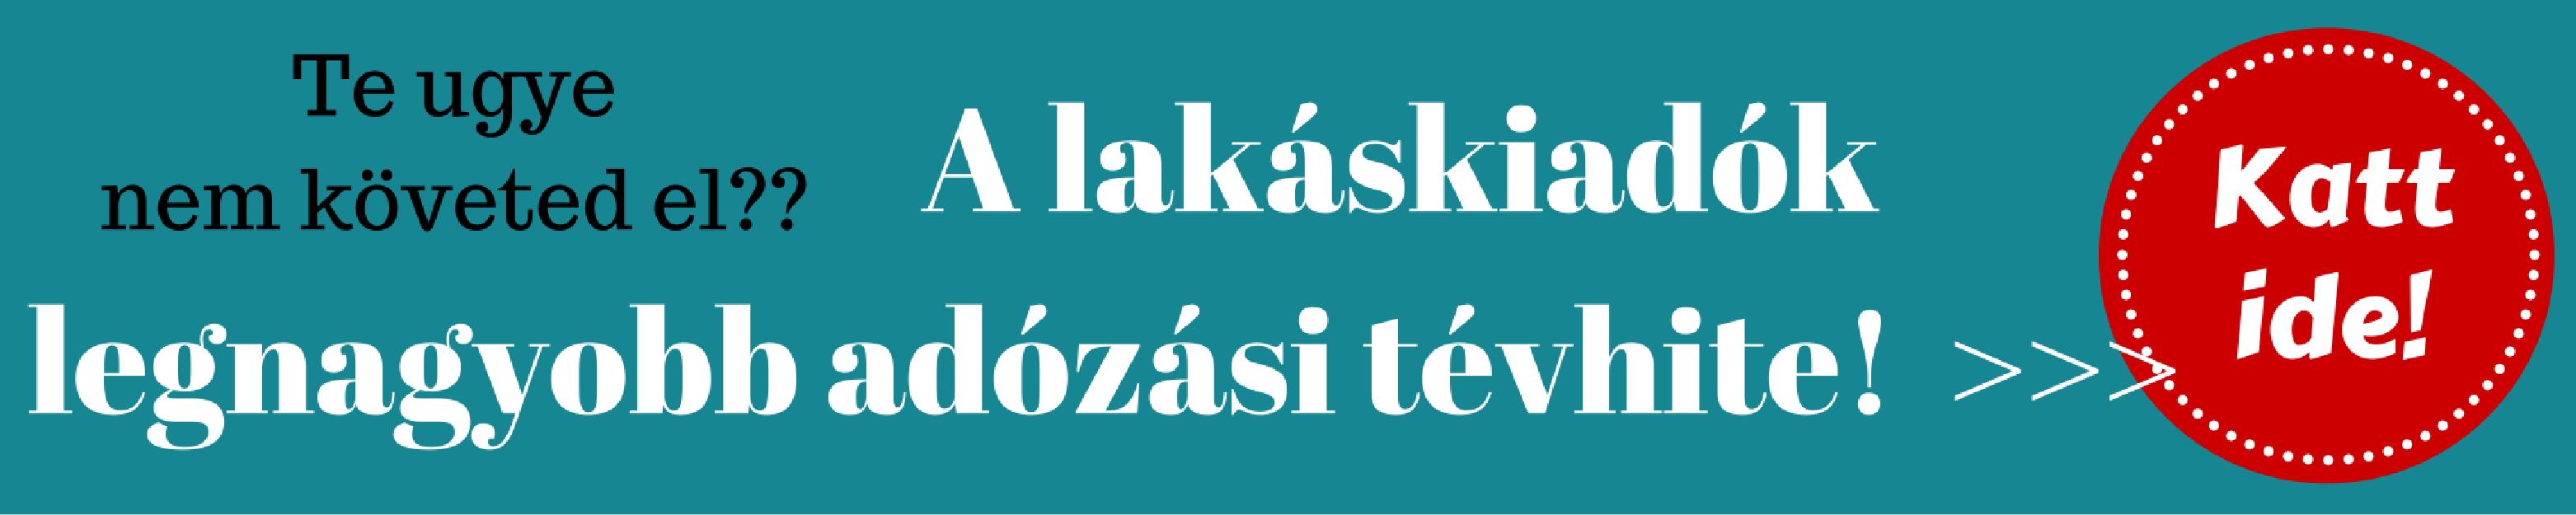 http://tudatosadozo.hu/lakaskiadas-adozas-tevhit/?utm_source=bannermain/